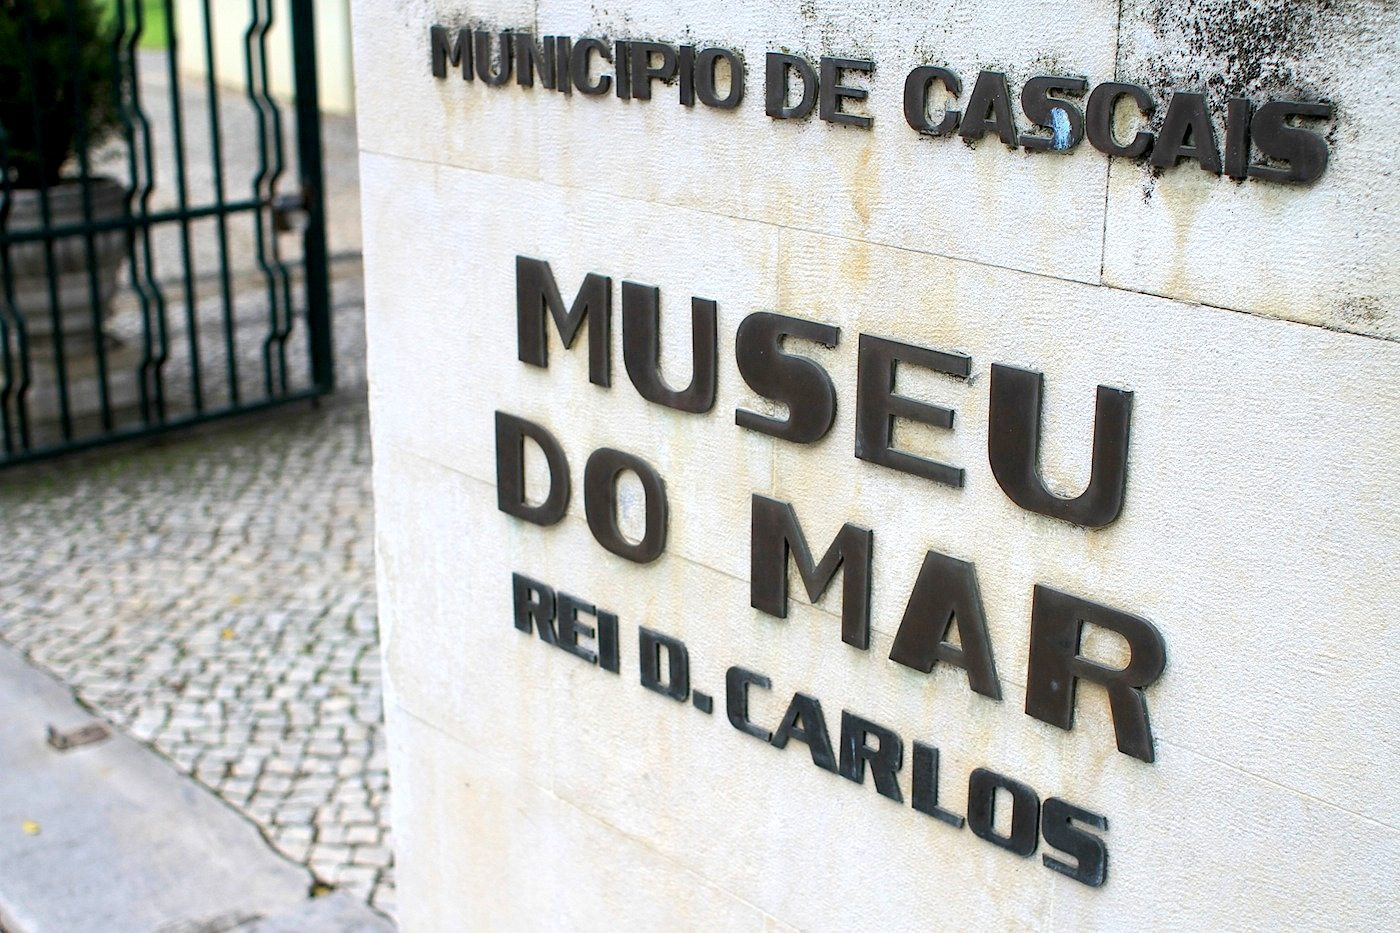 Meeresmuseum.  Das Haus wurde 1992 als Museu do Mar Rei D. Carlos eröffnet.